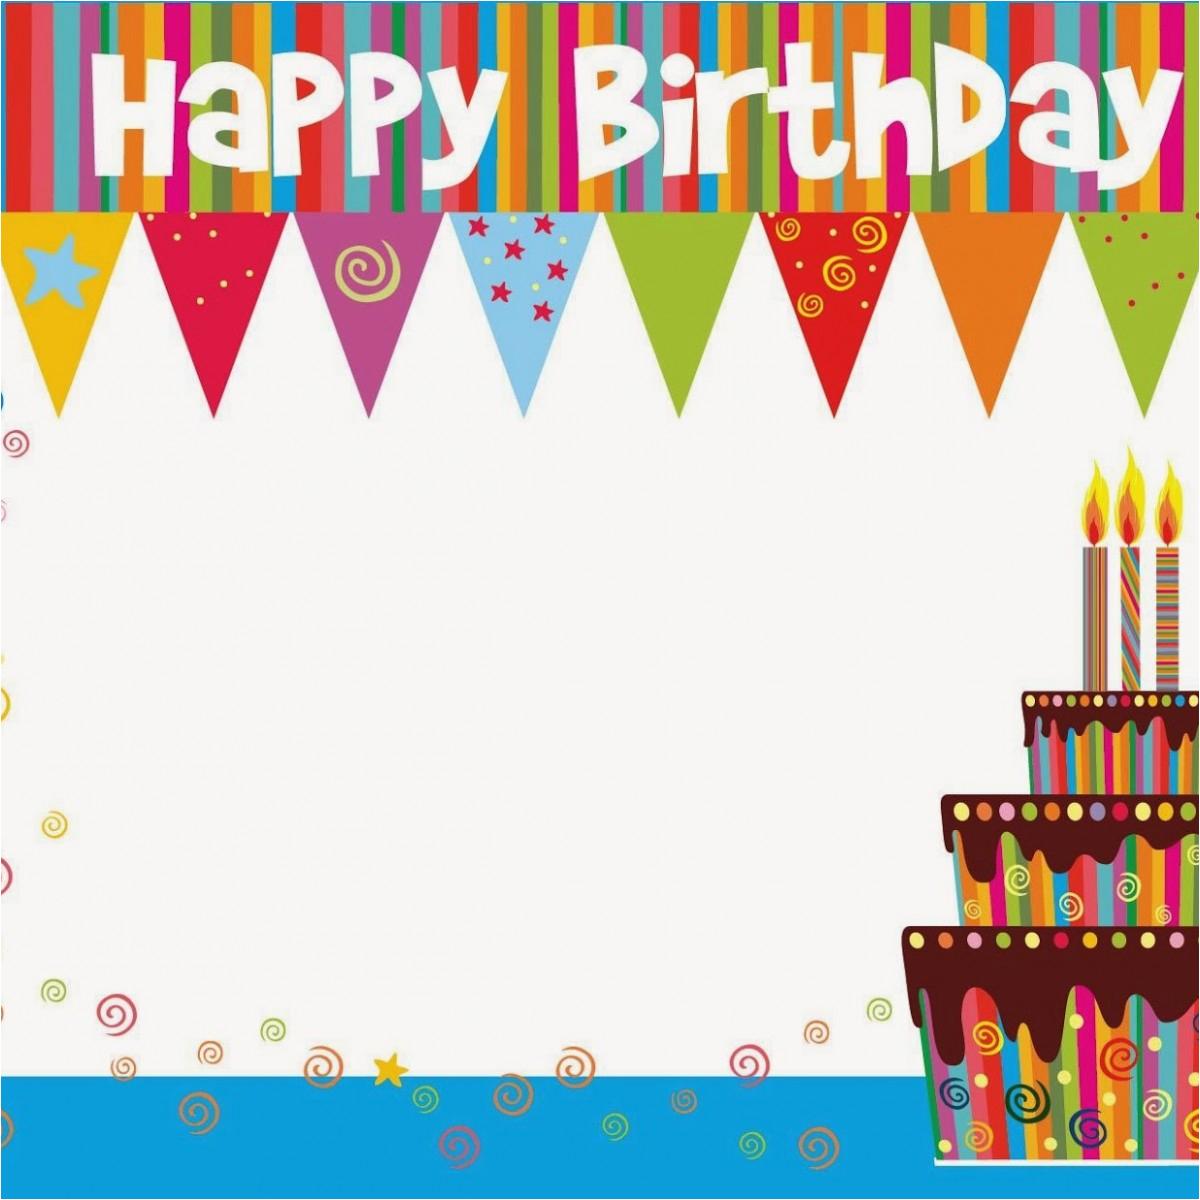 send birthday card online card design ideas